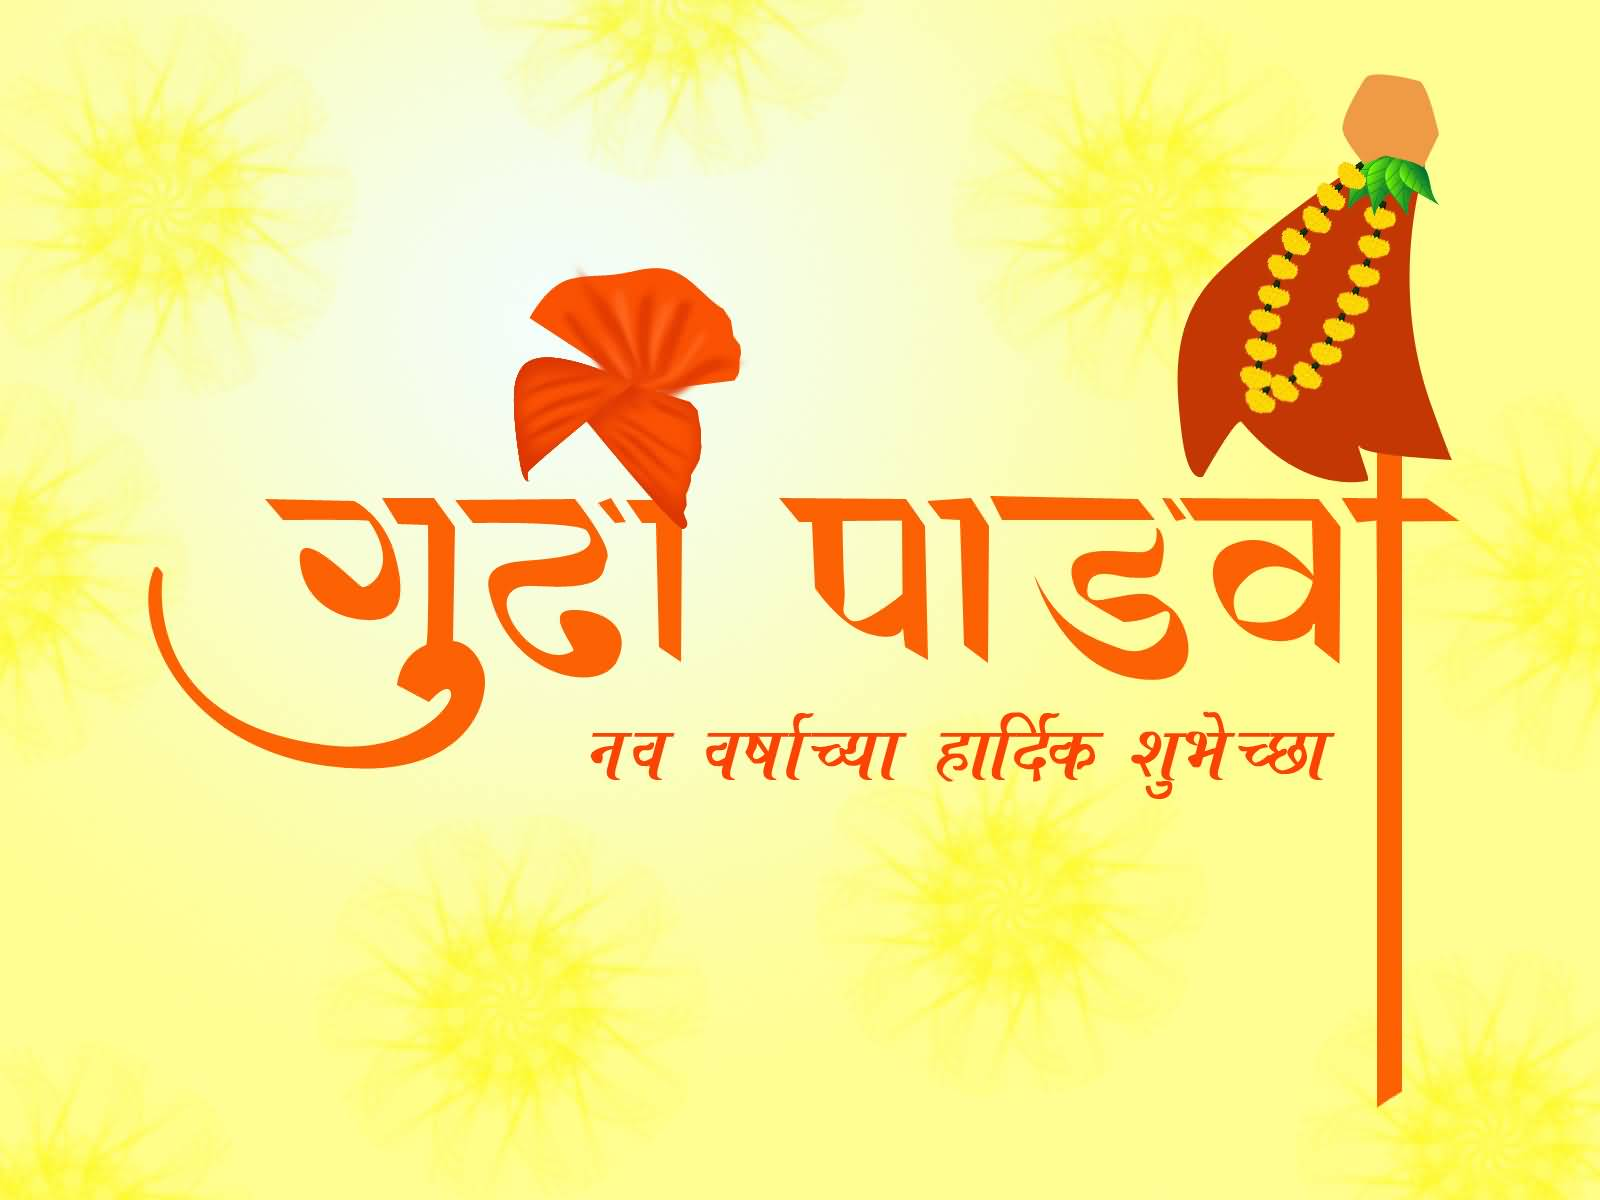 Gudi padwa wishes in marathi kristyandbryce Gallery